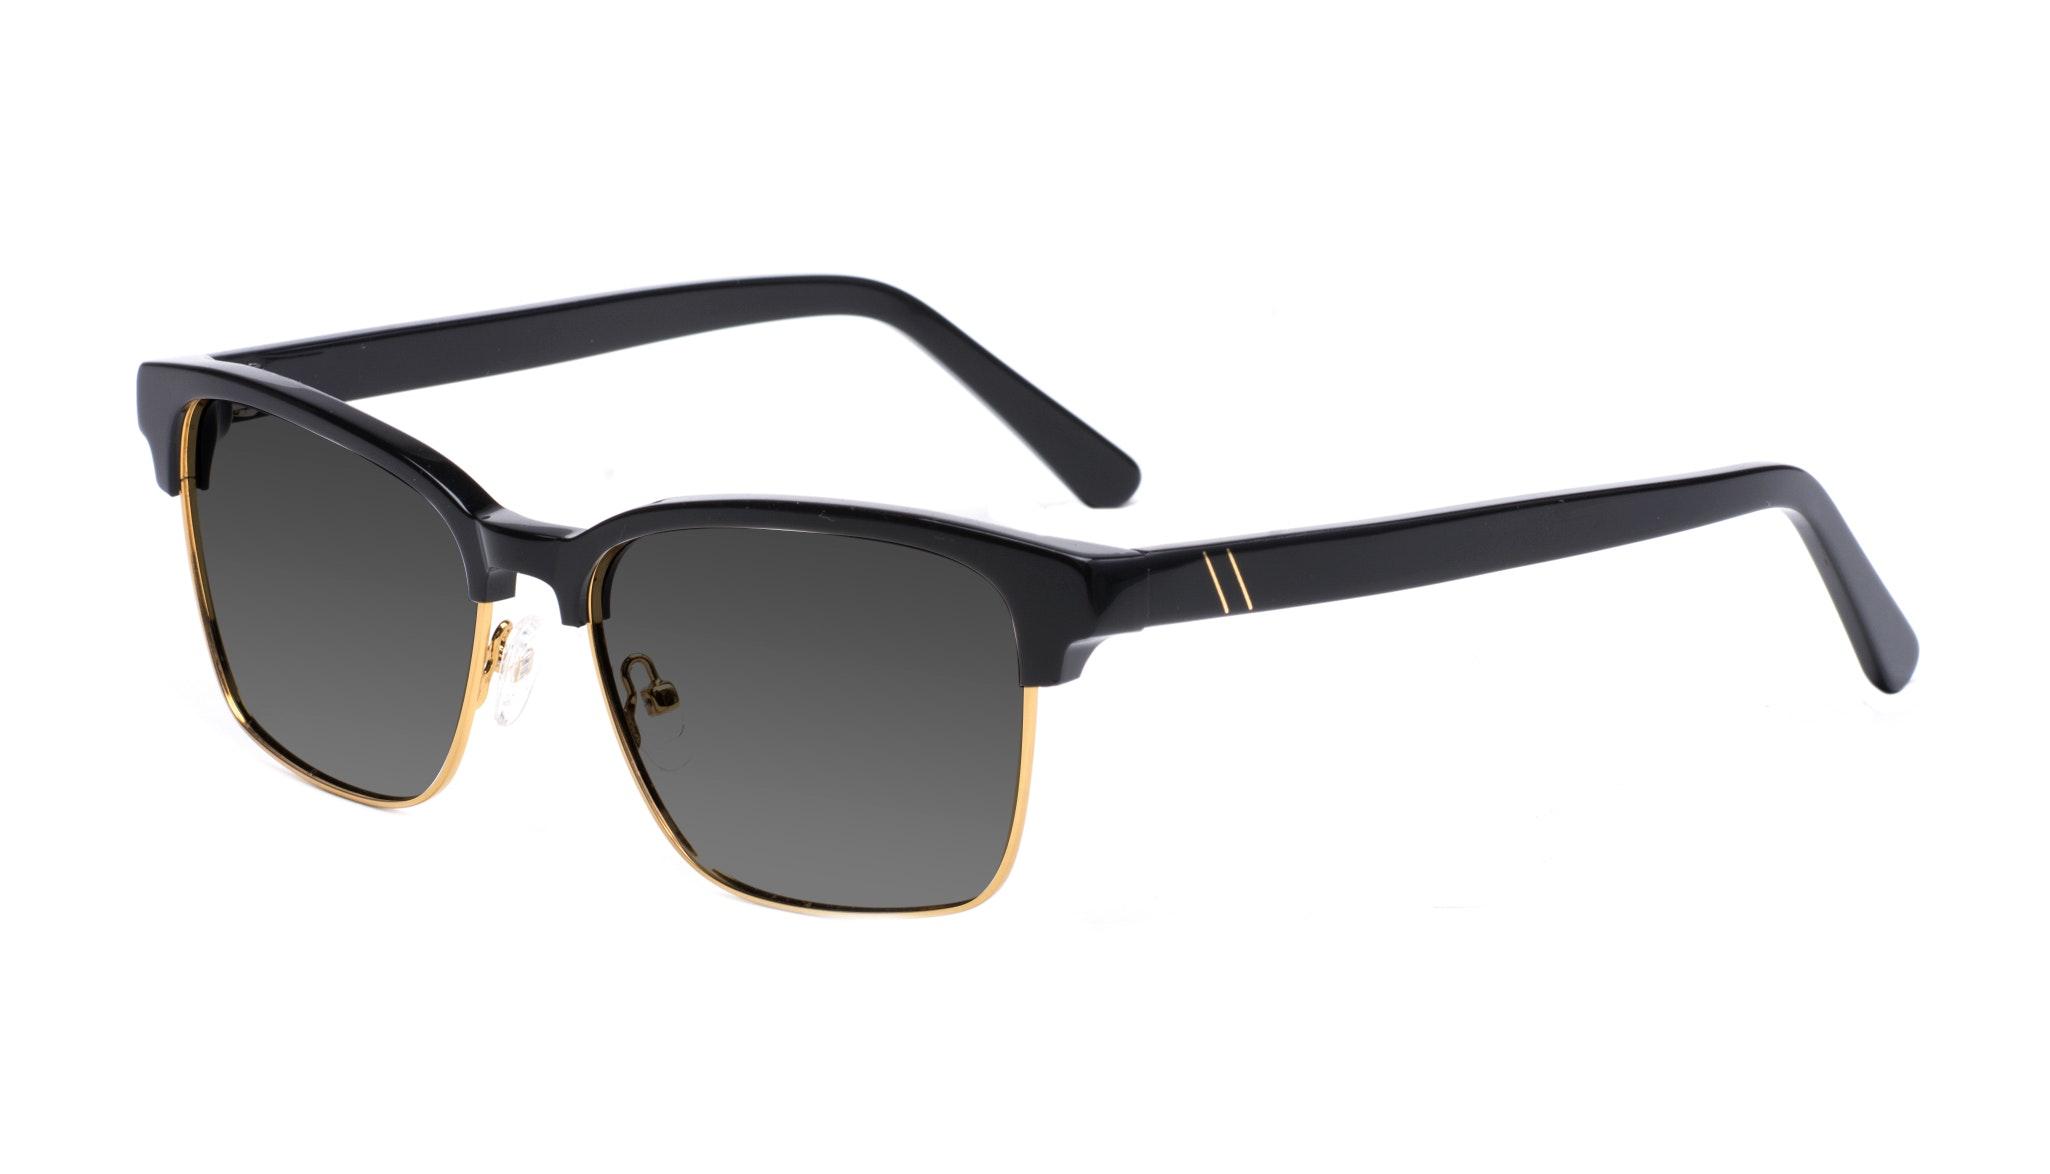 Affordable Fashion Glasses Rectangle Square Sunglasses Men Gallery Black Tilt